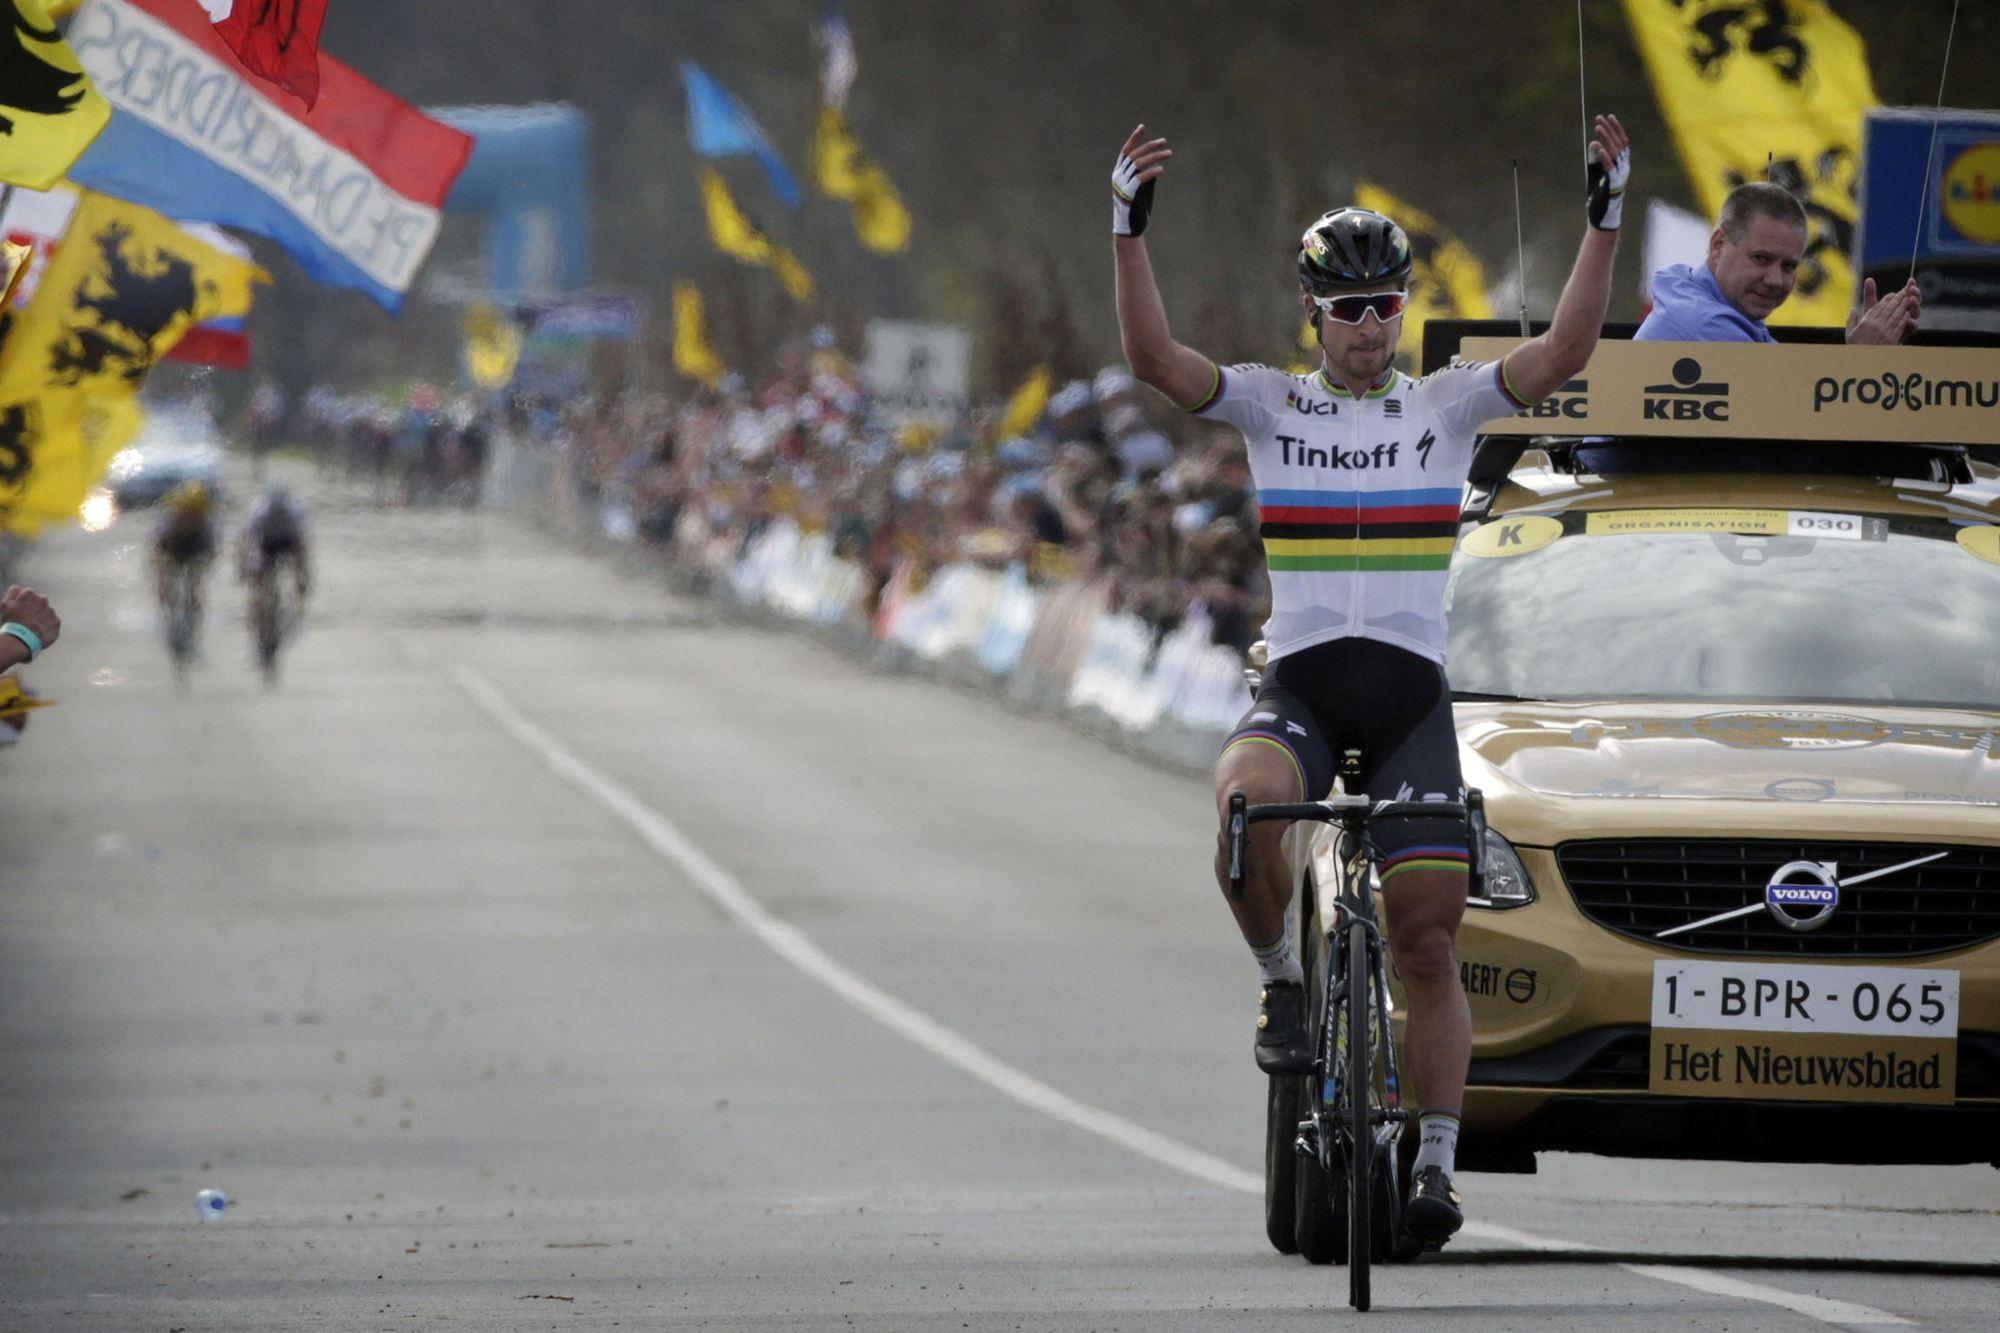 Giro delle Fiandre 2016 - 100a Ronde Van Vlaanderen - Tour of Flanders - Brugge - Oudenaarde 255 km - 03/04/2015 - Peter Sagan (Tinkoff) - foto Nico Vereecken/PN/BettiniPhoto©2016